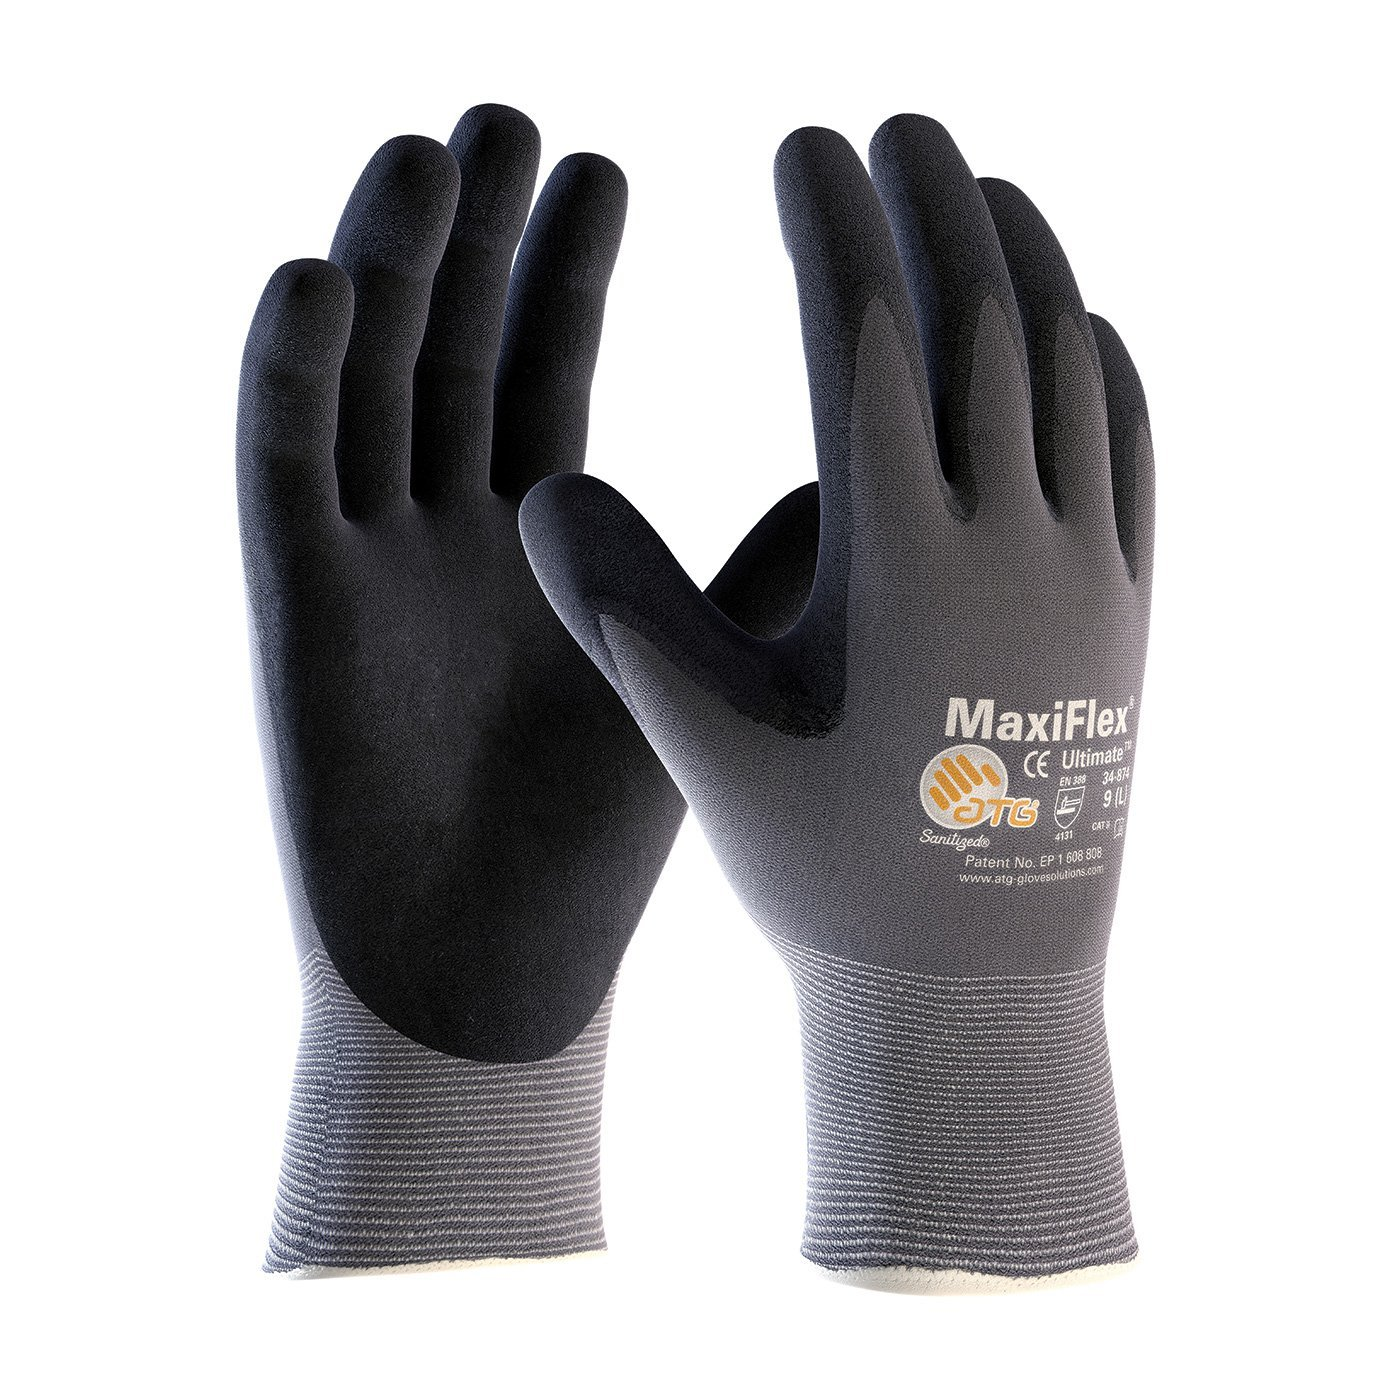 12 Pairs G-Tek TM MaxiFlex 34-874 Seamless Knit Nylon Gloves Size X-Large